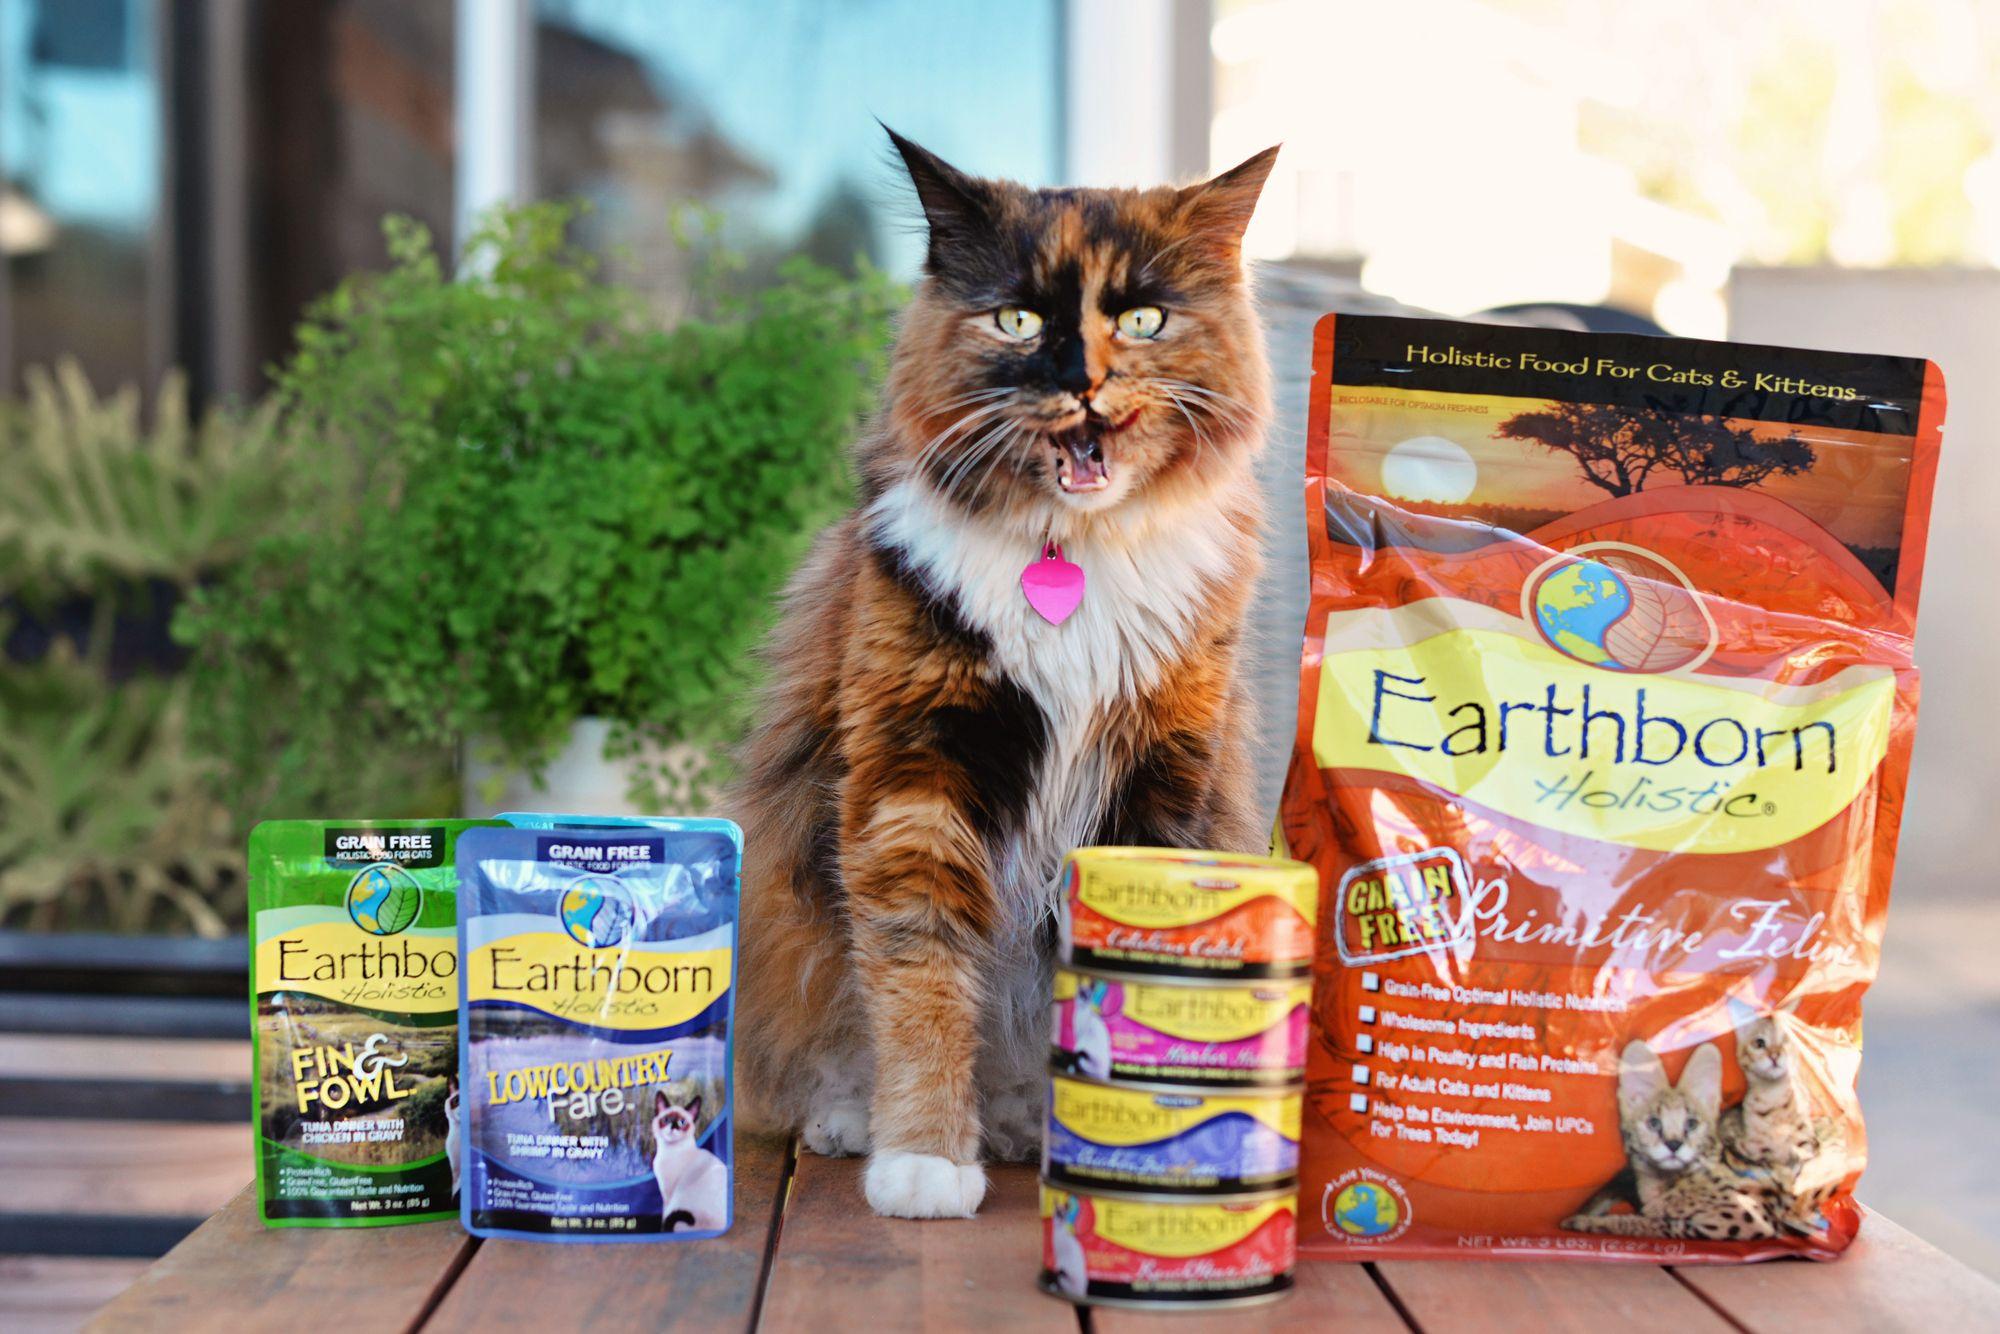 Earthborn Holistic Food For Cats In 2020 Holistic Cat Food Holistic Recipes Dry Cat Food